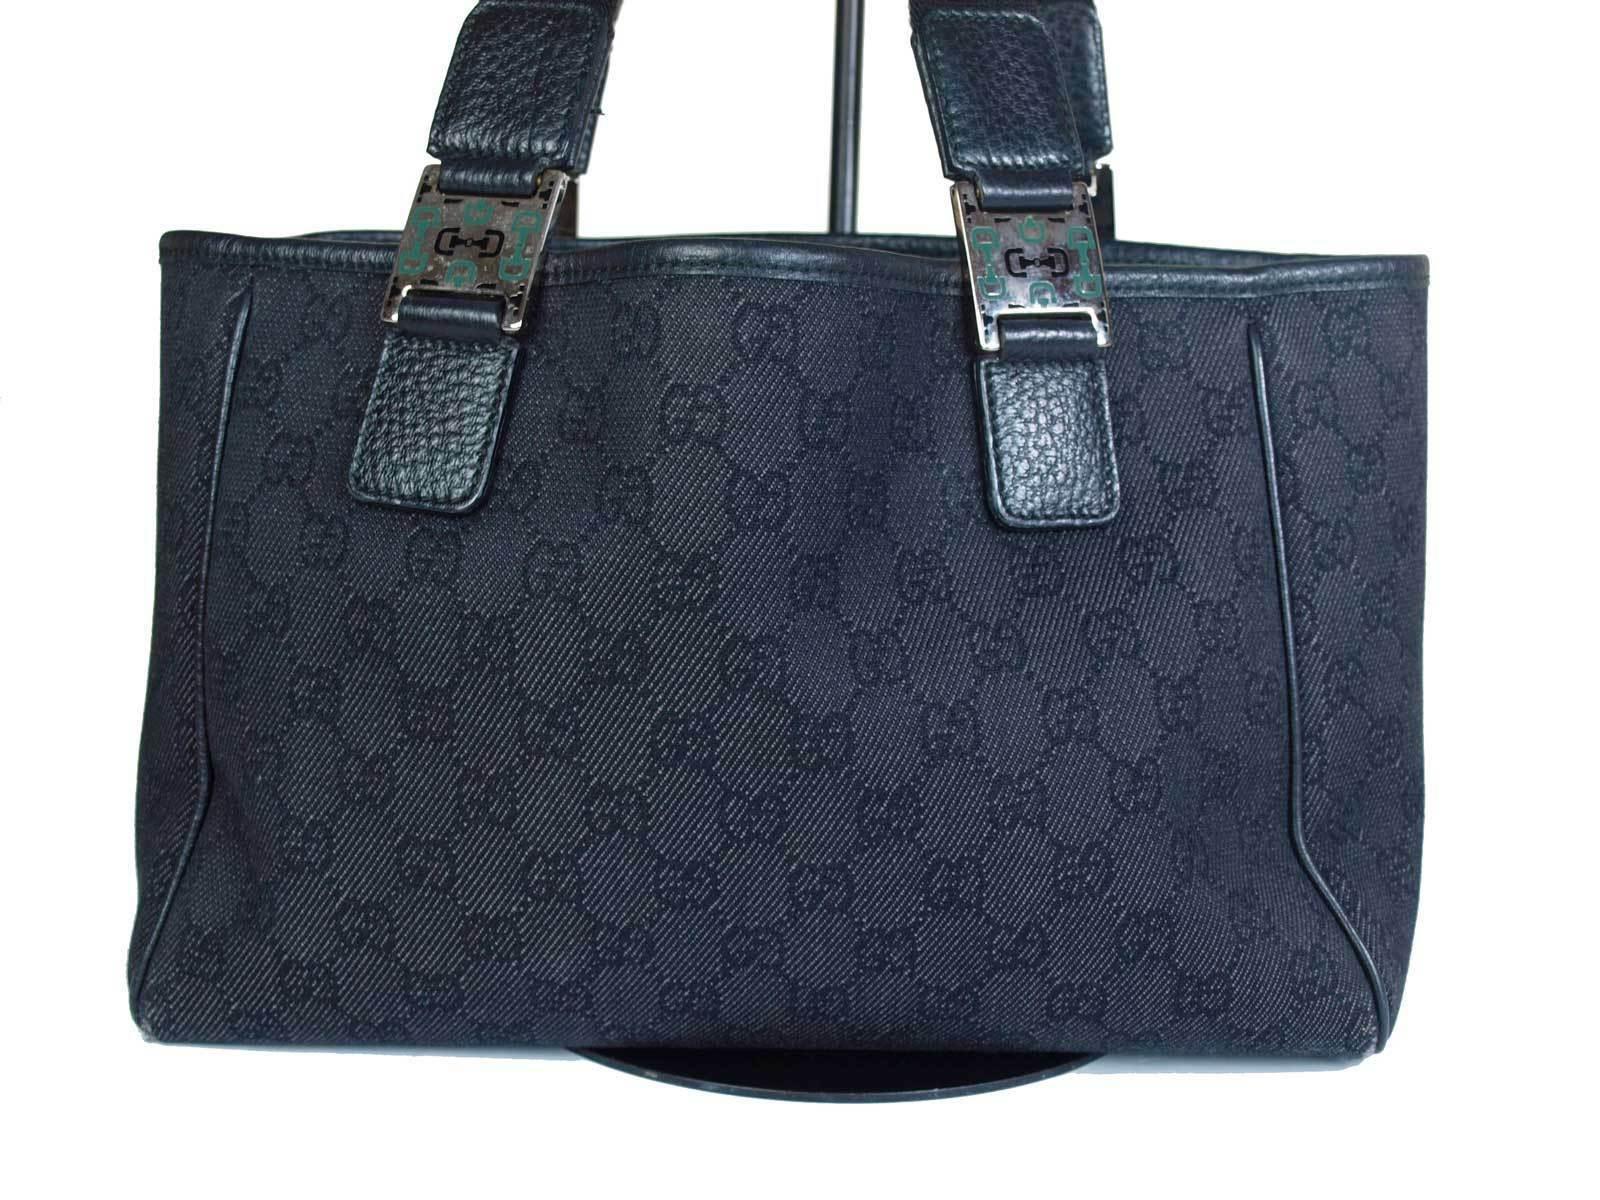 Authentic GUCCI GG Pattern Canvas Leather Black Shoulder Bag GS1865